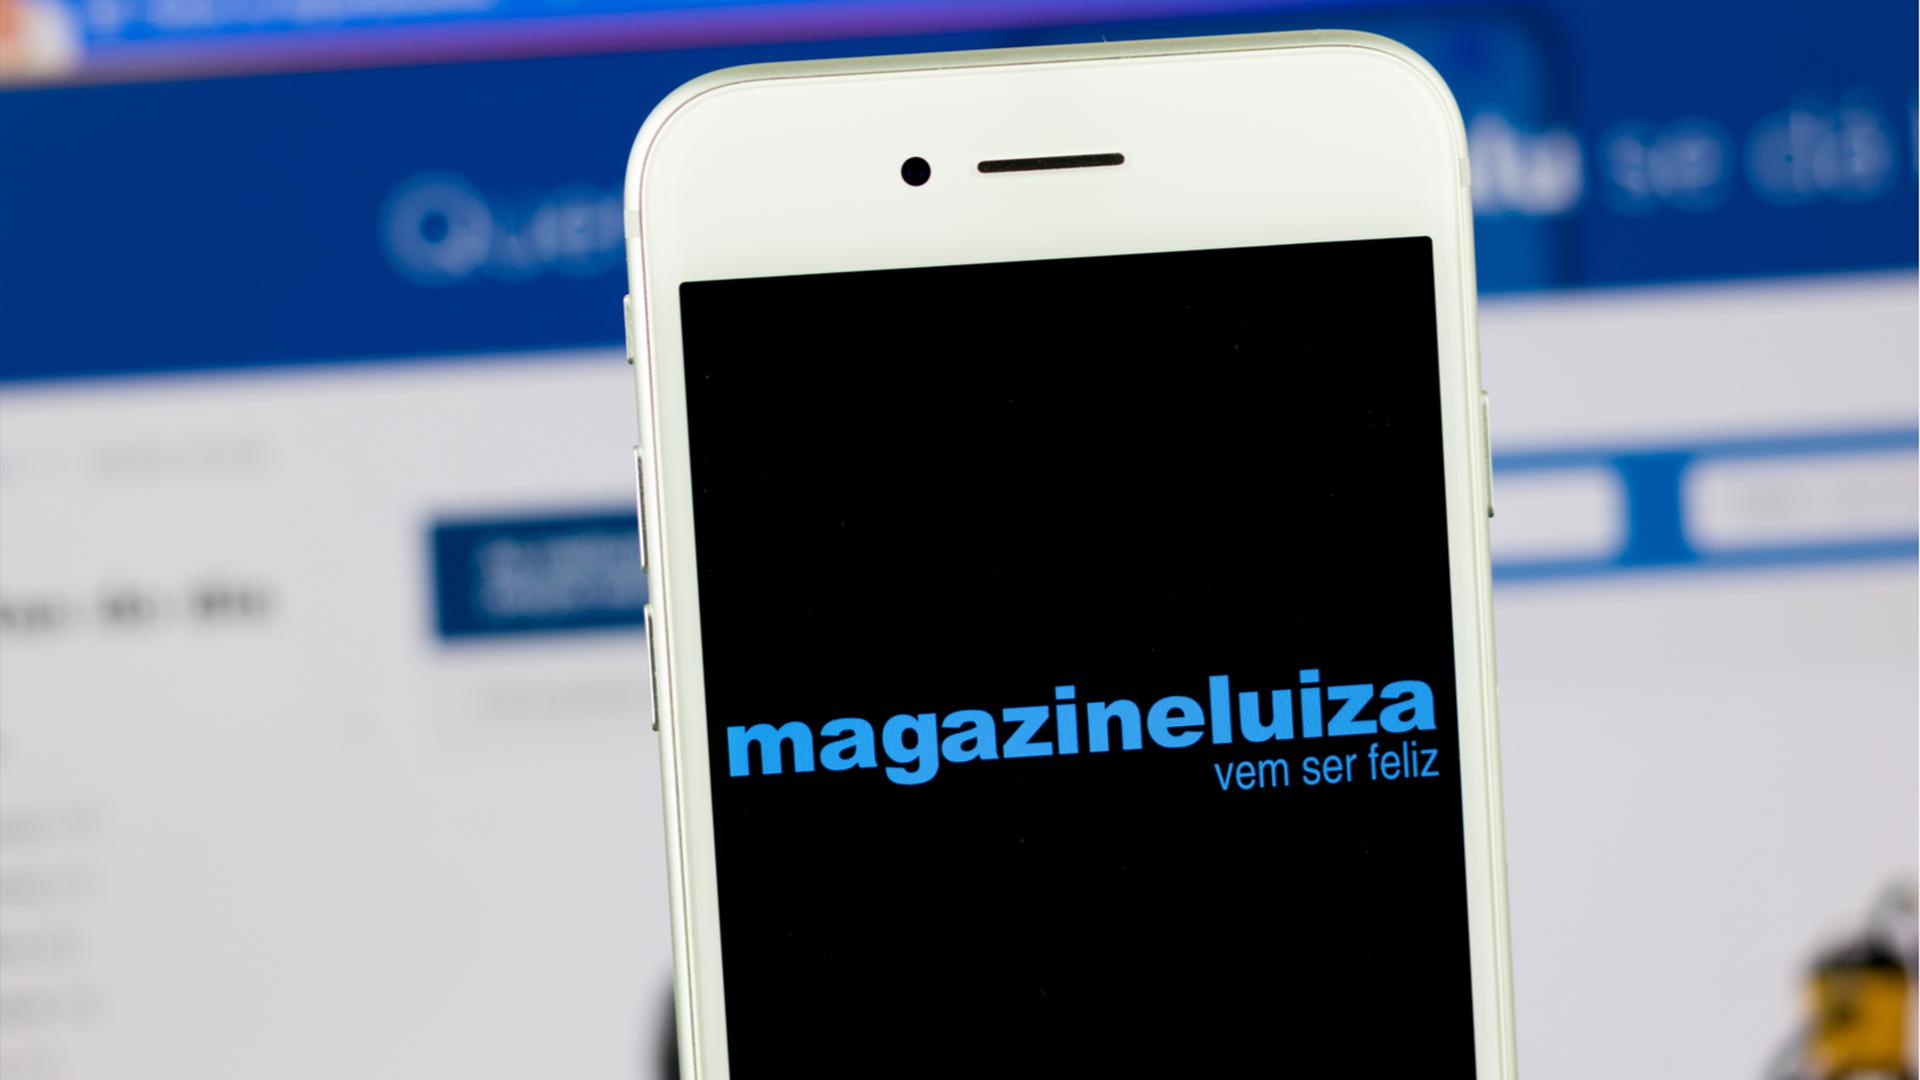 Magazine luiza capa 2